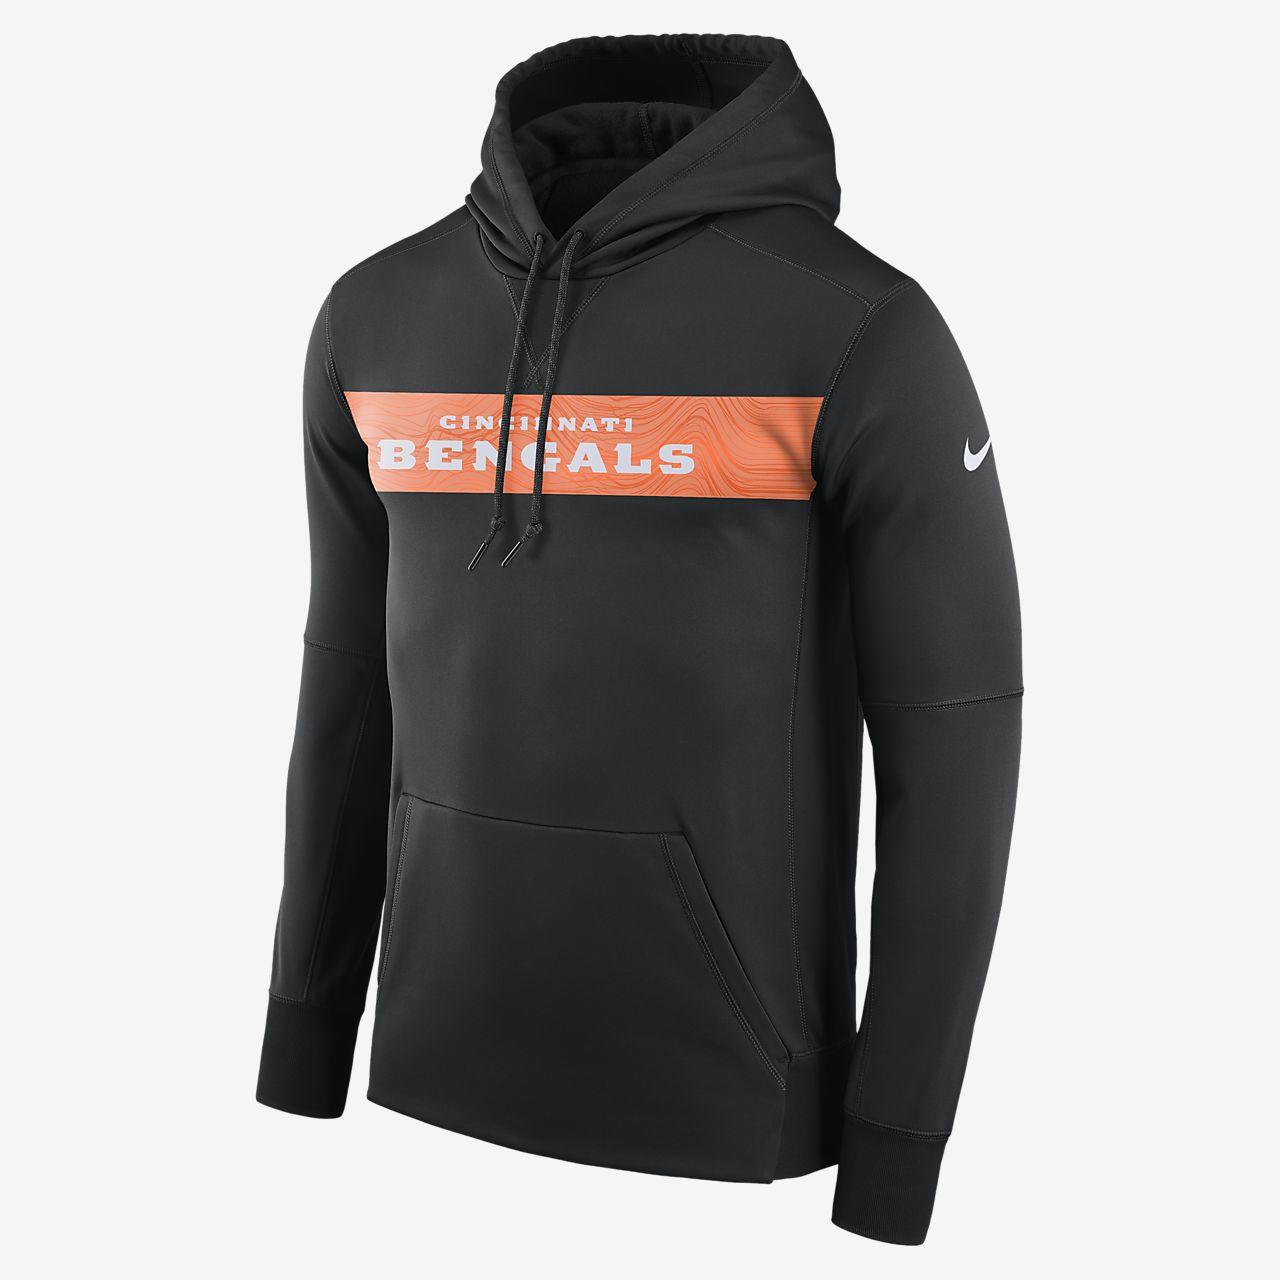 Nike Dri-FIT Therma (NFL Bengals) Men s Pullover Hoodie. Nike.com 70ac032b3015